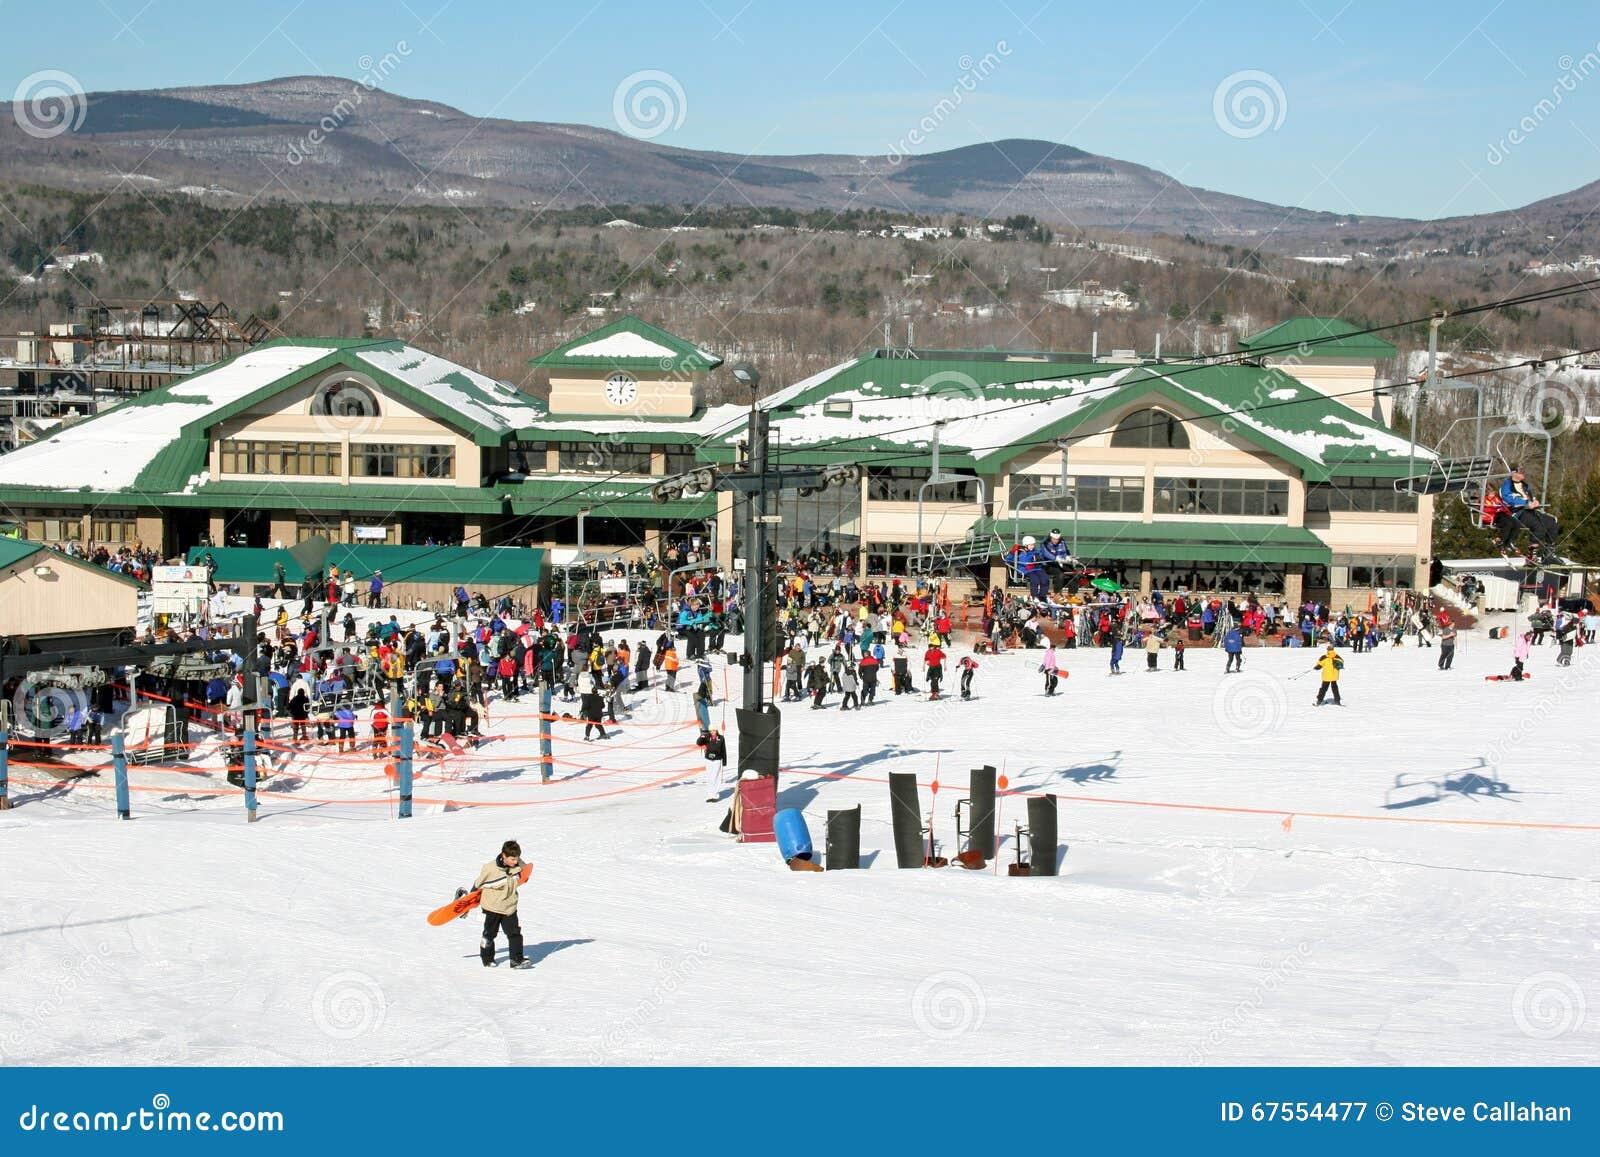 snow tubing, windham mountain ski editorial stock image - image of